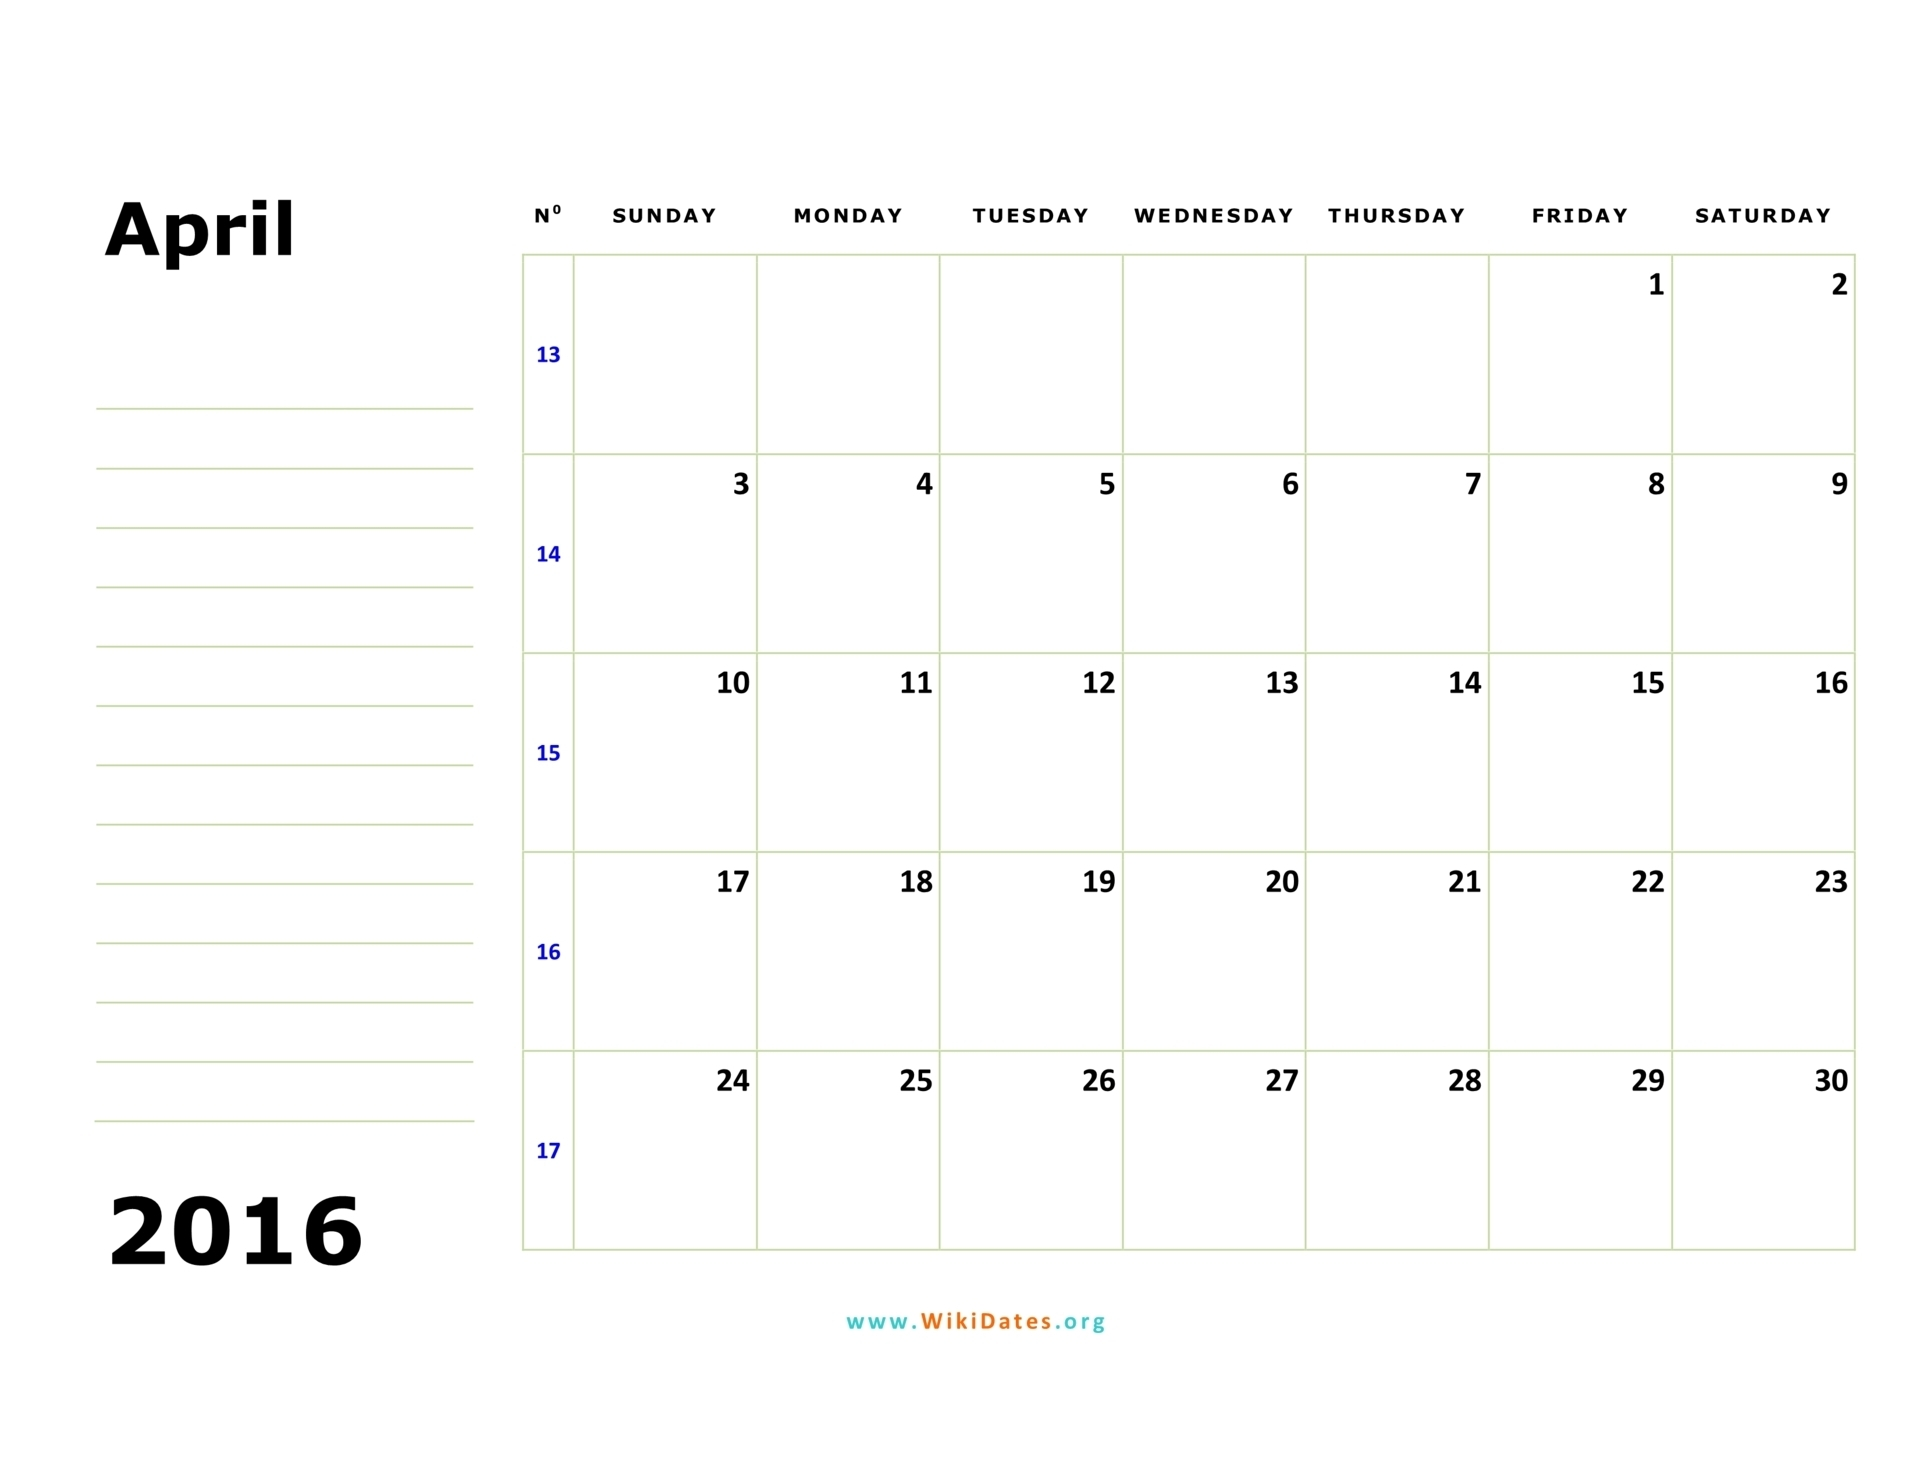 April 2016 Calendar Wikidates  Xjb